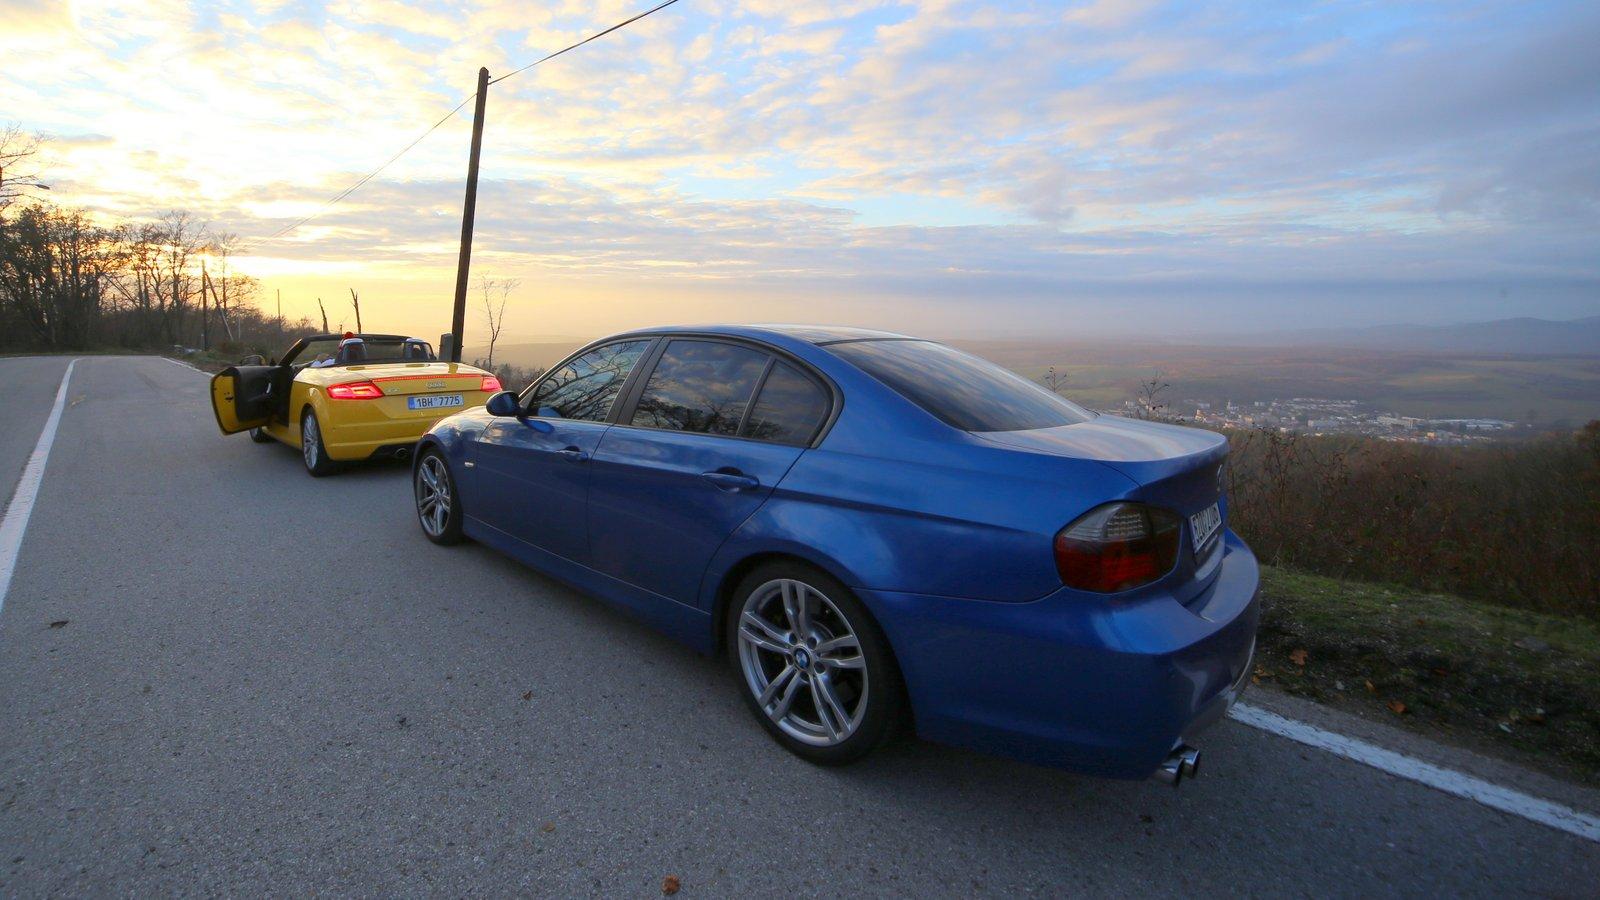 Audi TT&BMW 330I